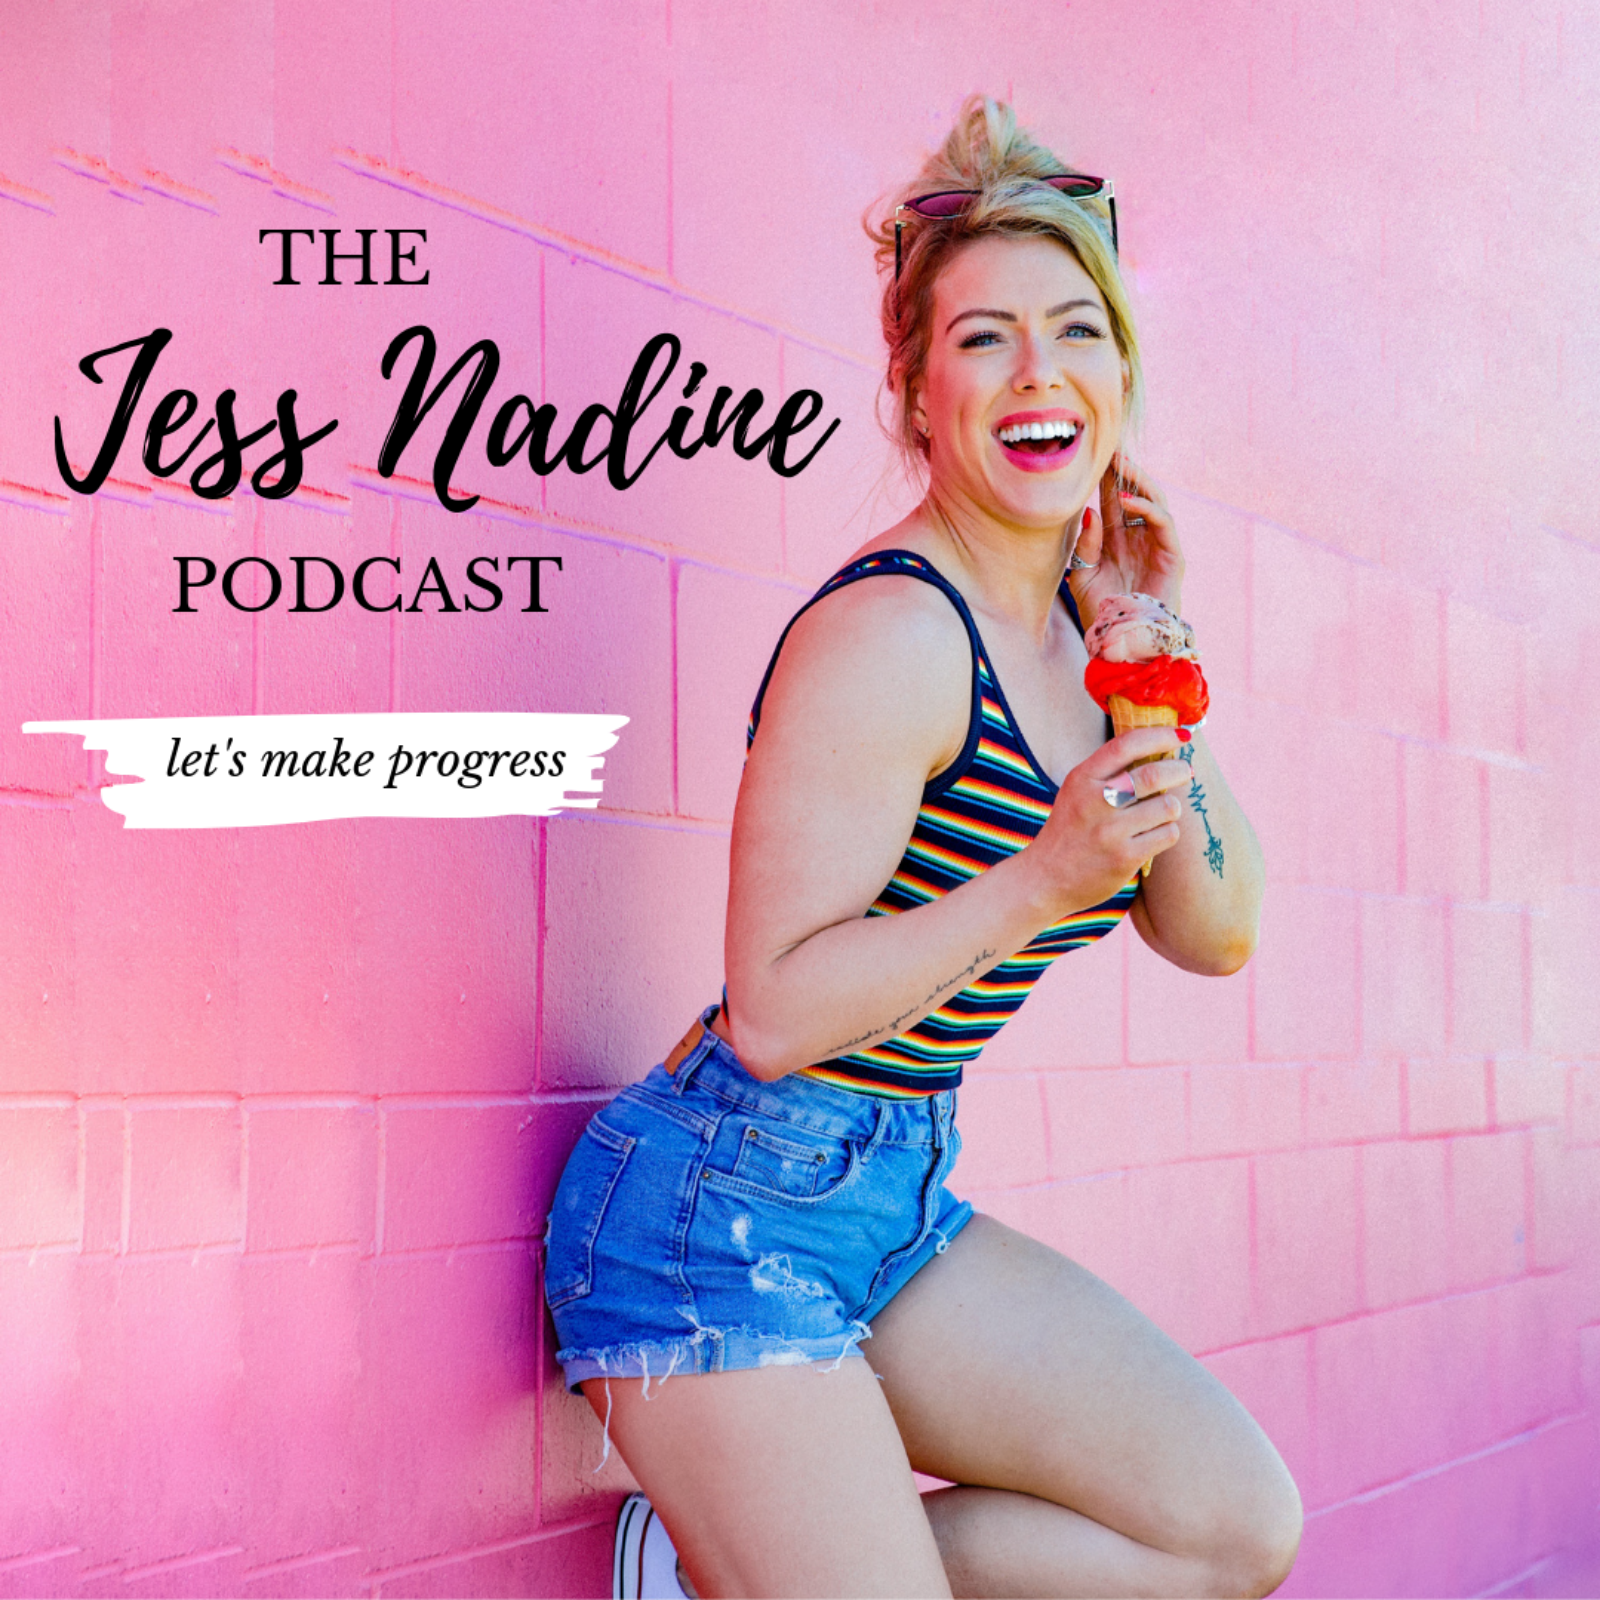 The Jess Nadine Podcast show art